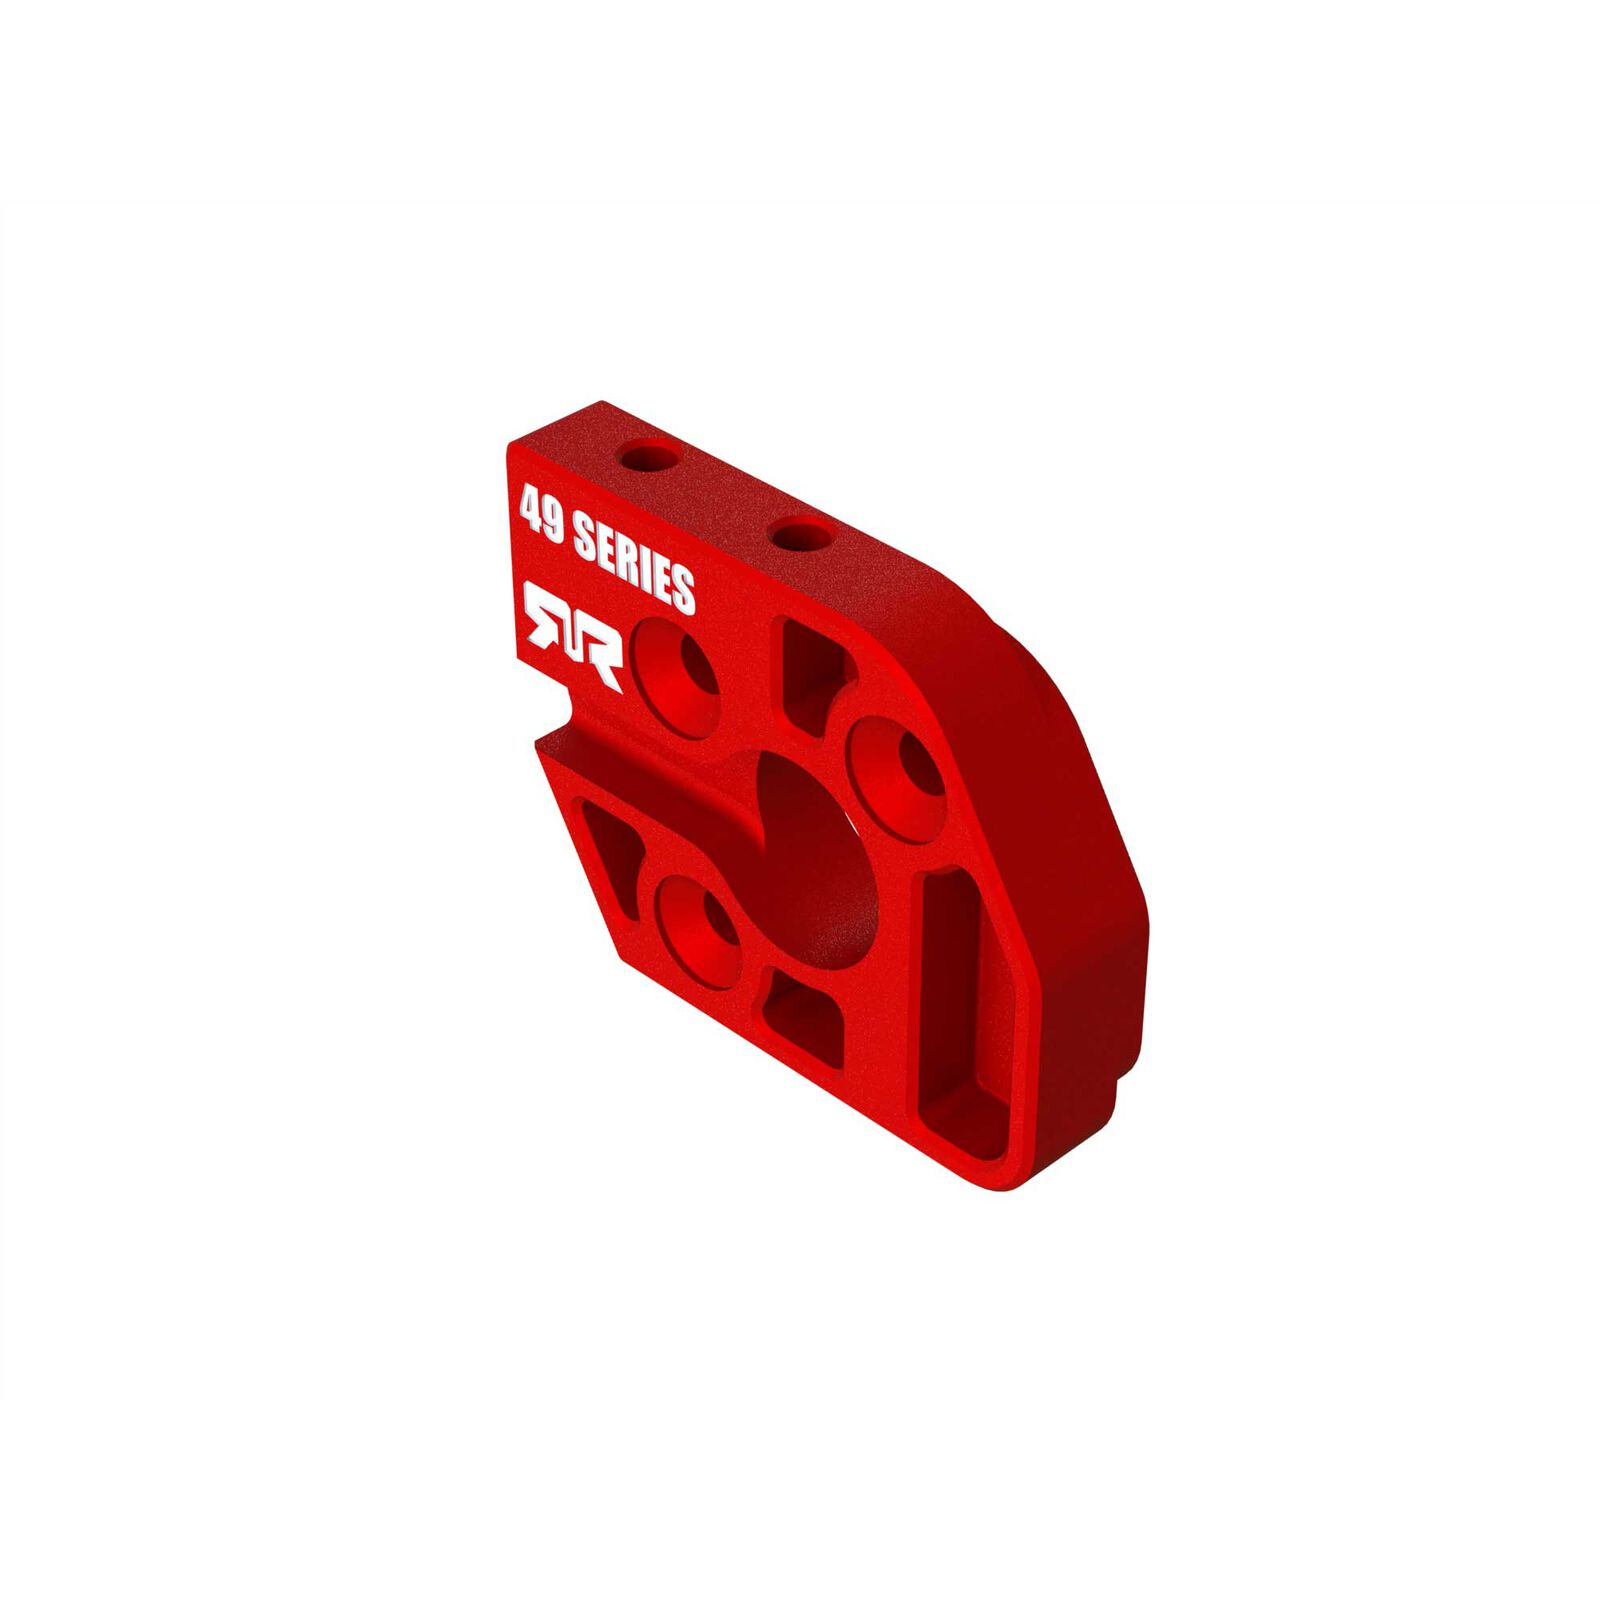 Aluminum Motor Plate 49 Series Red